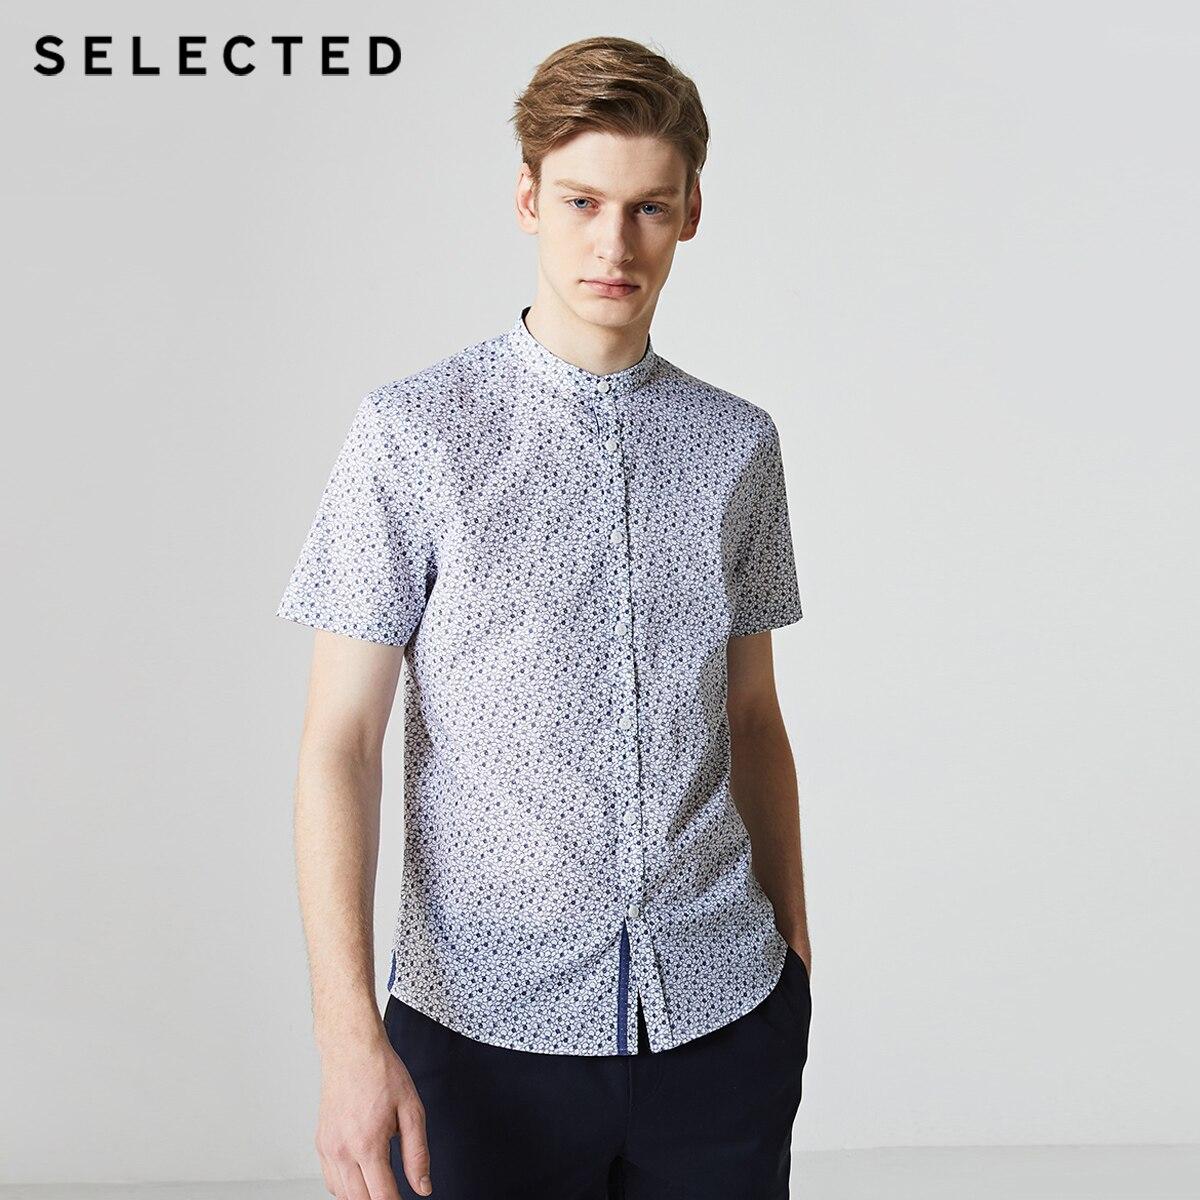 SELECTED Men's Slim Fit 100% Cotton Floral Short-sleeved Shirt S|419204558